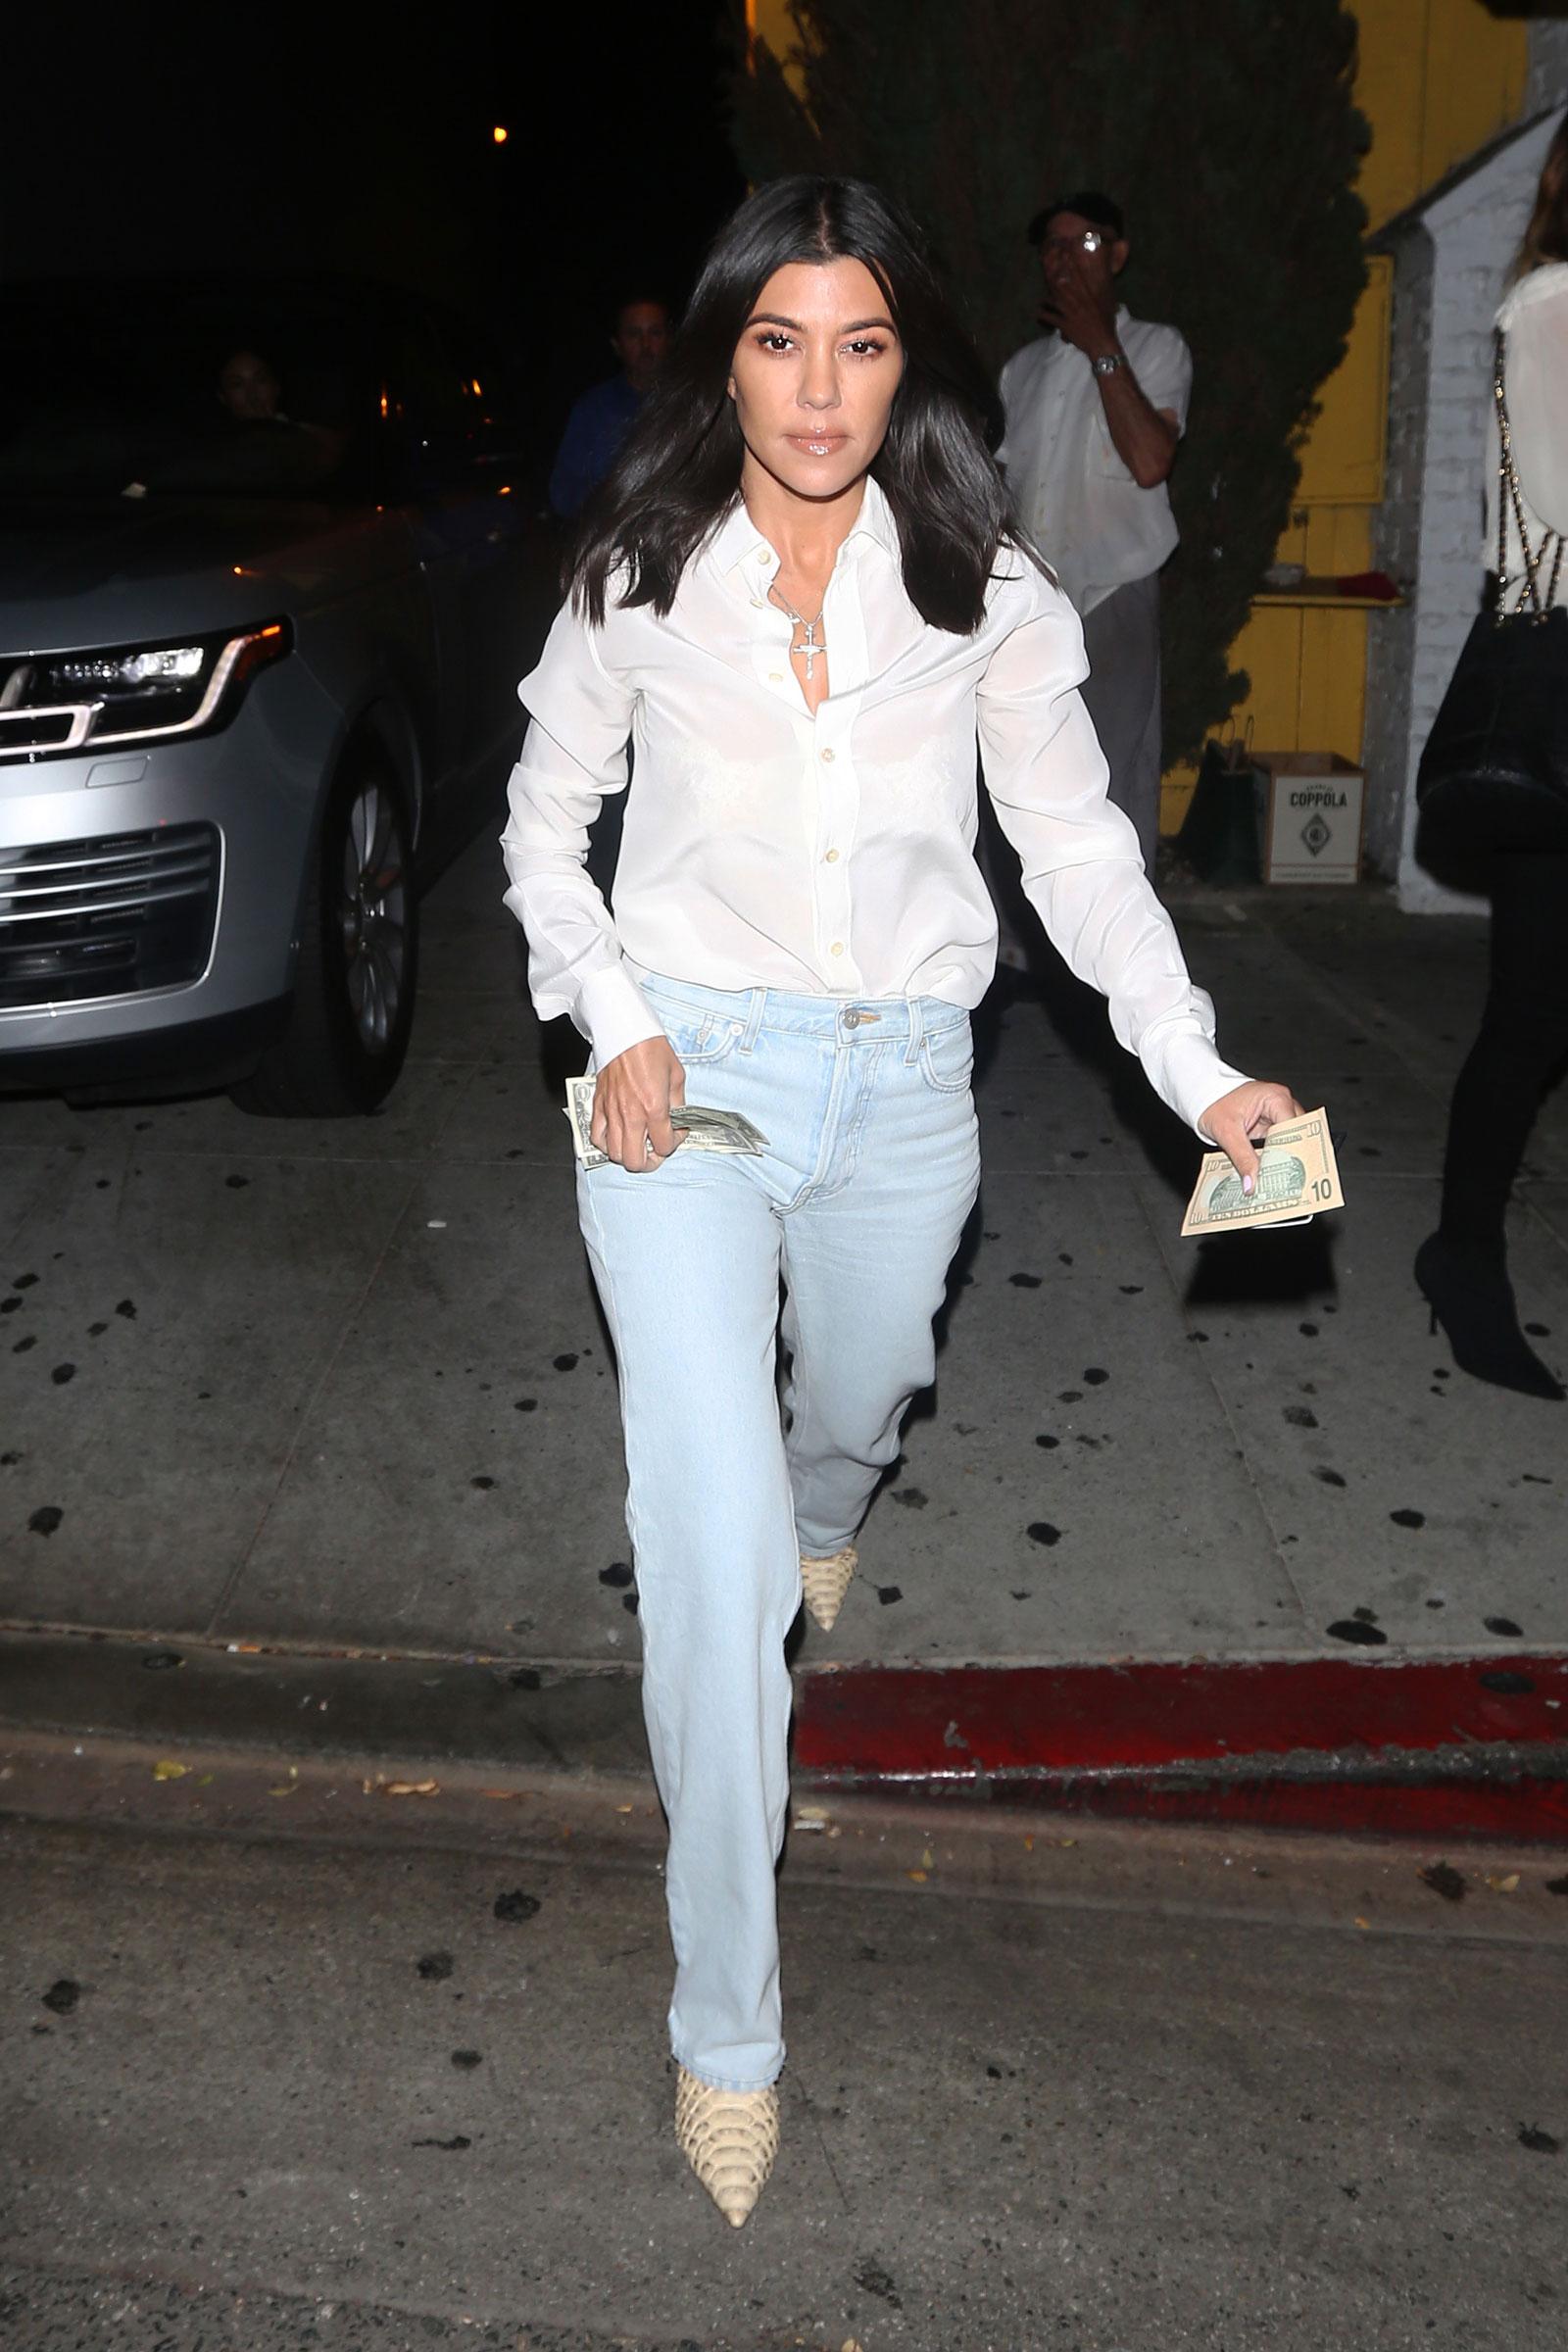 fa5e36d12f Kourtney Kardashian Python Boots and White Shirt